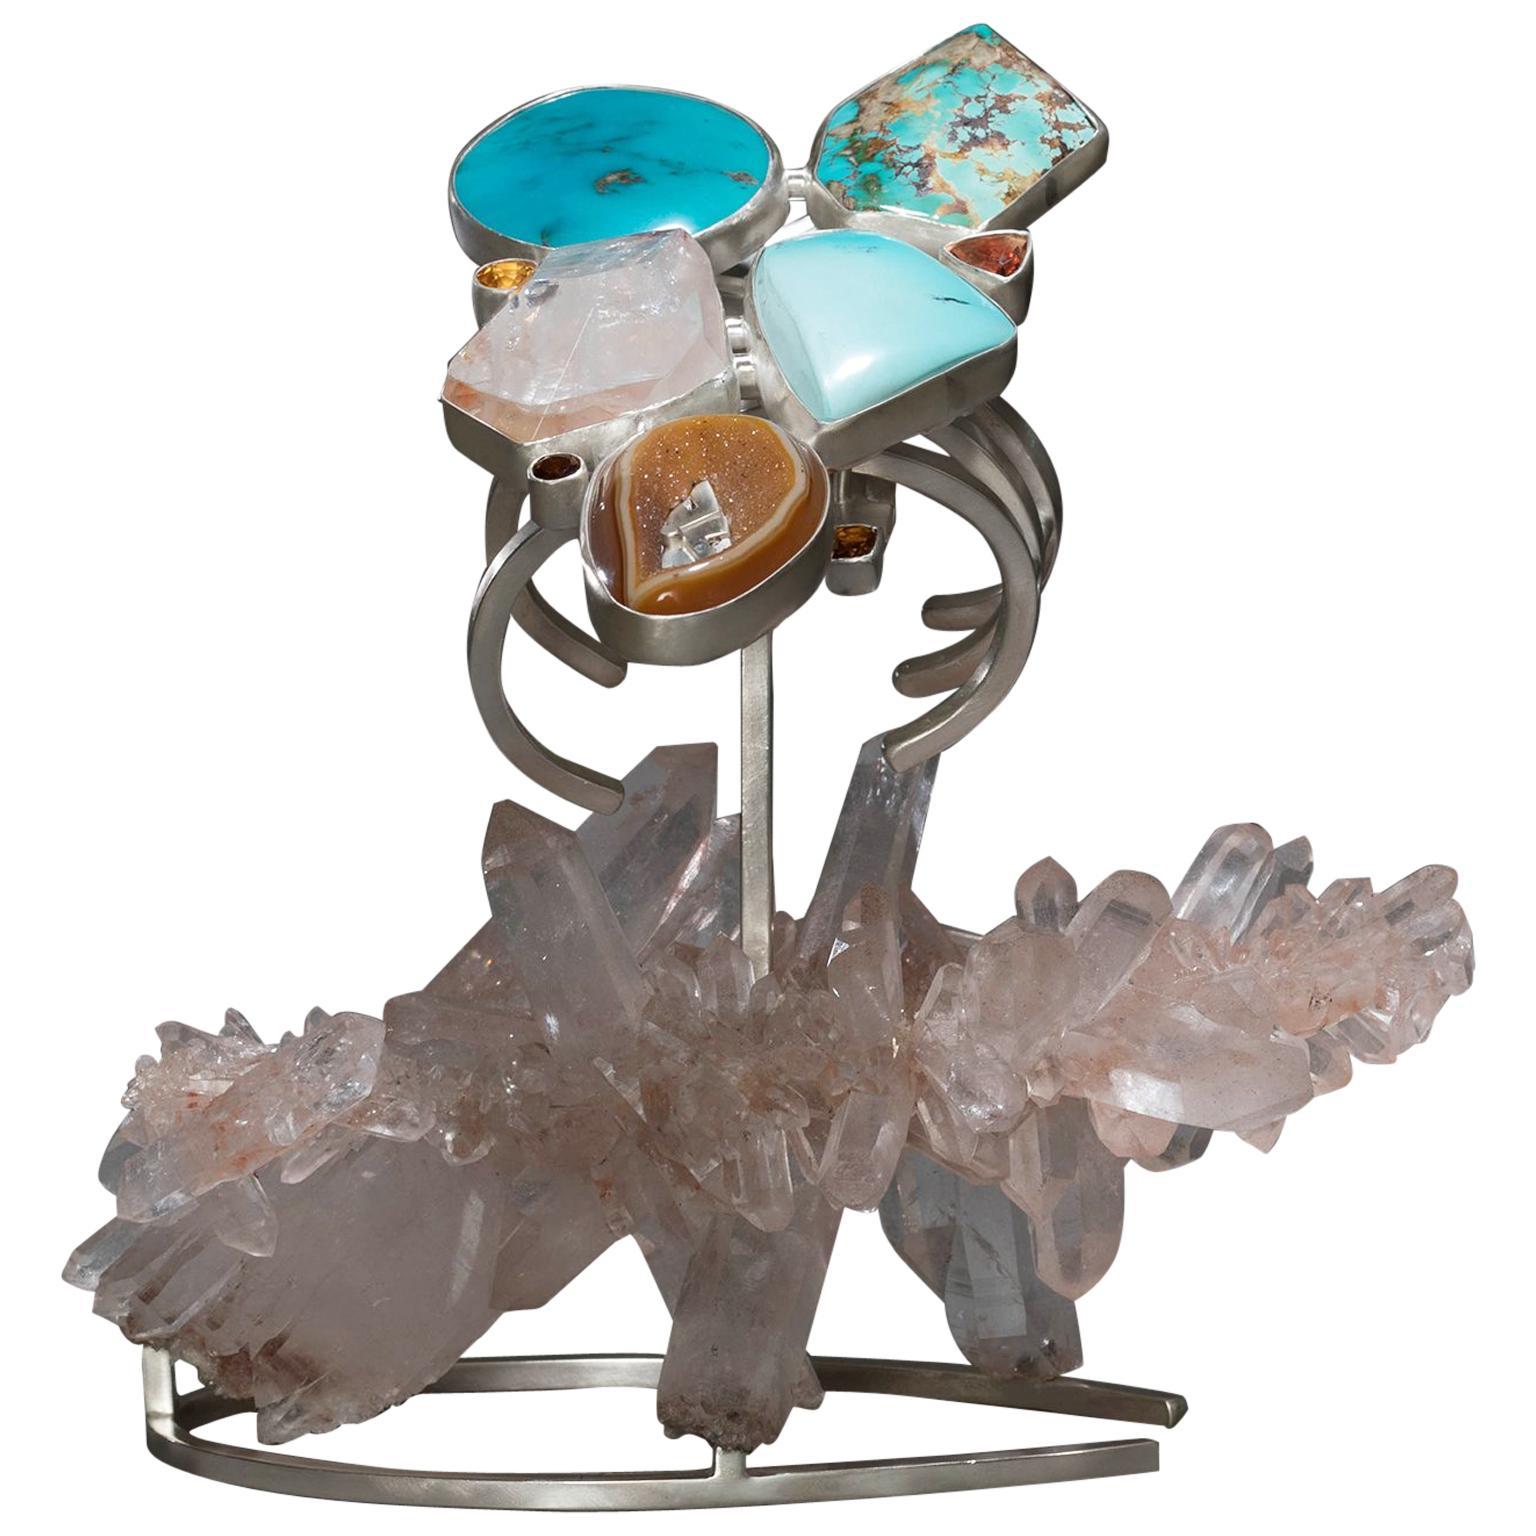 Studio Greytak 'Turquoise Bracelet on Himalayan Quartz' with Citrine & Sunstone